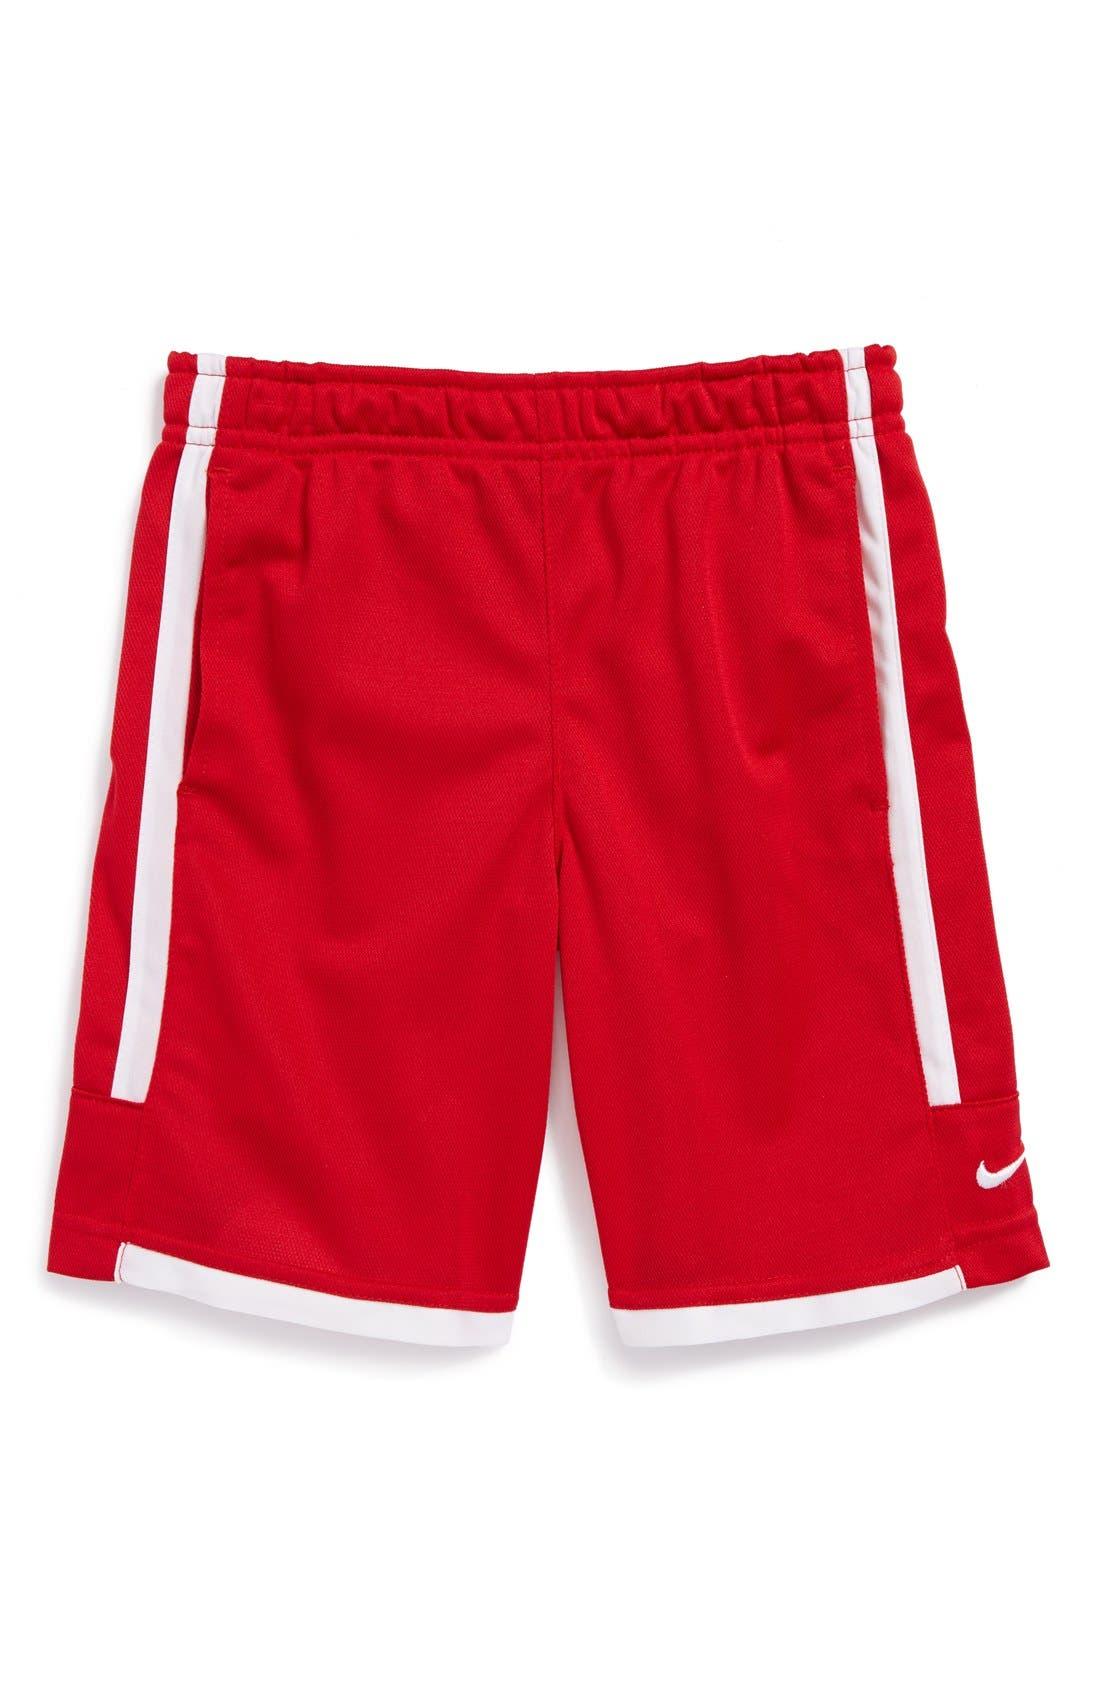 Alternate Image 1 Selected - Nike 'Double' Dri-FIT Shorts (Little Boys)